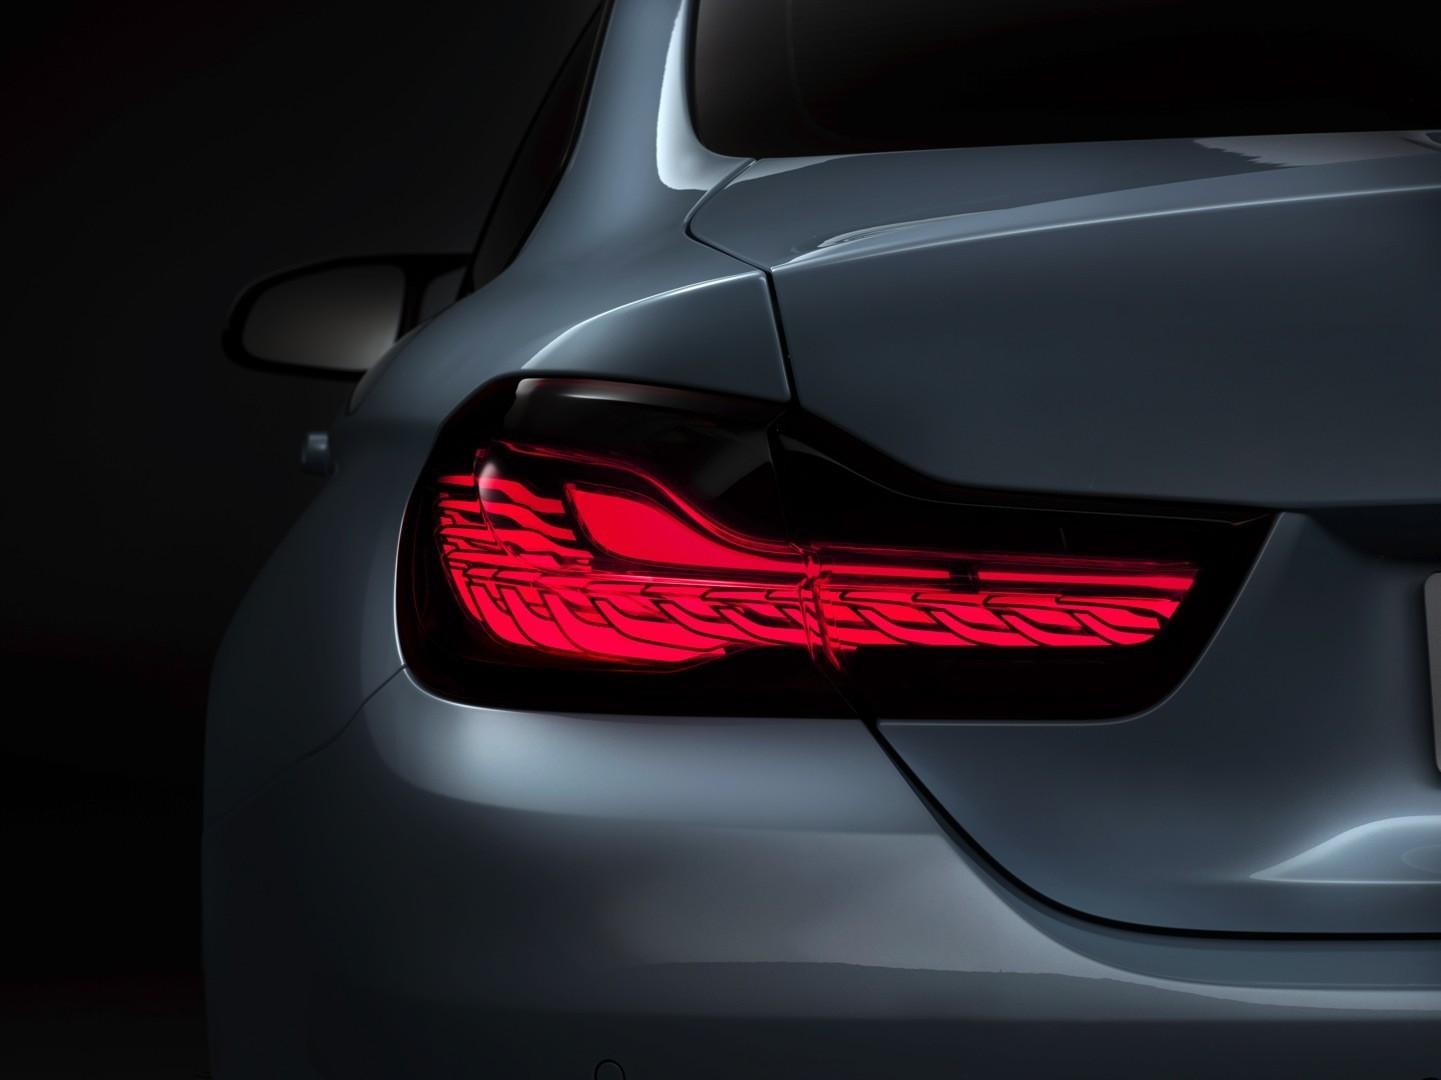 Bmw M4 Concept Iconic Lights Brings Intelligent Laser